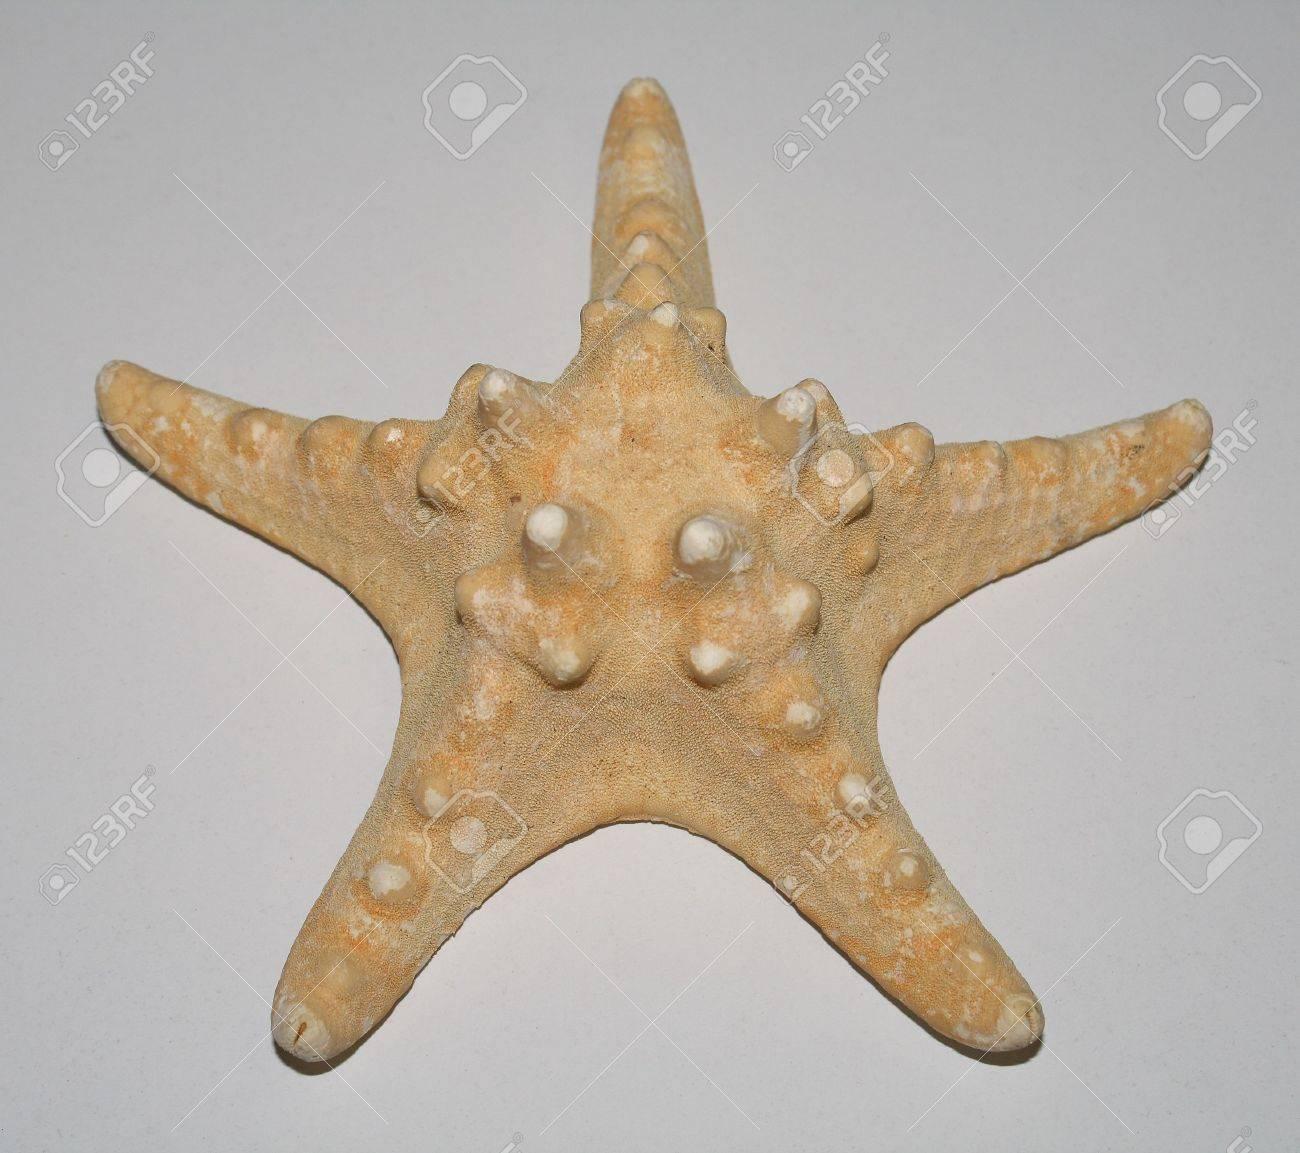 La naturaleza sin vida de estrella de mar  Foto de archivo - 5862396